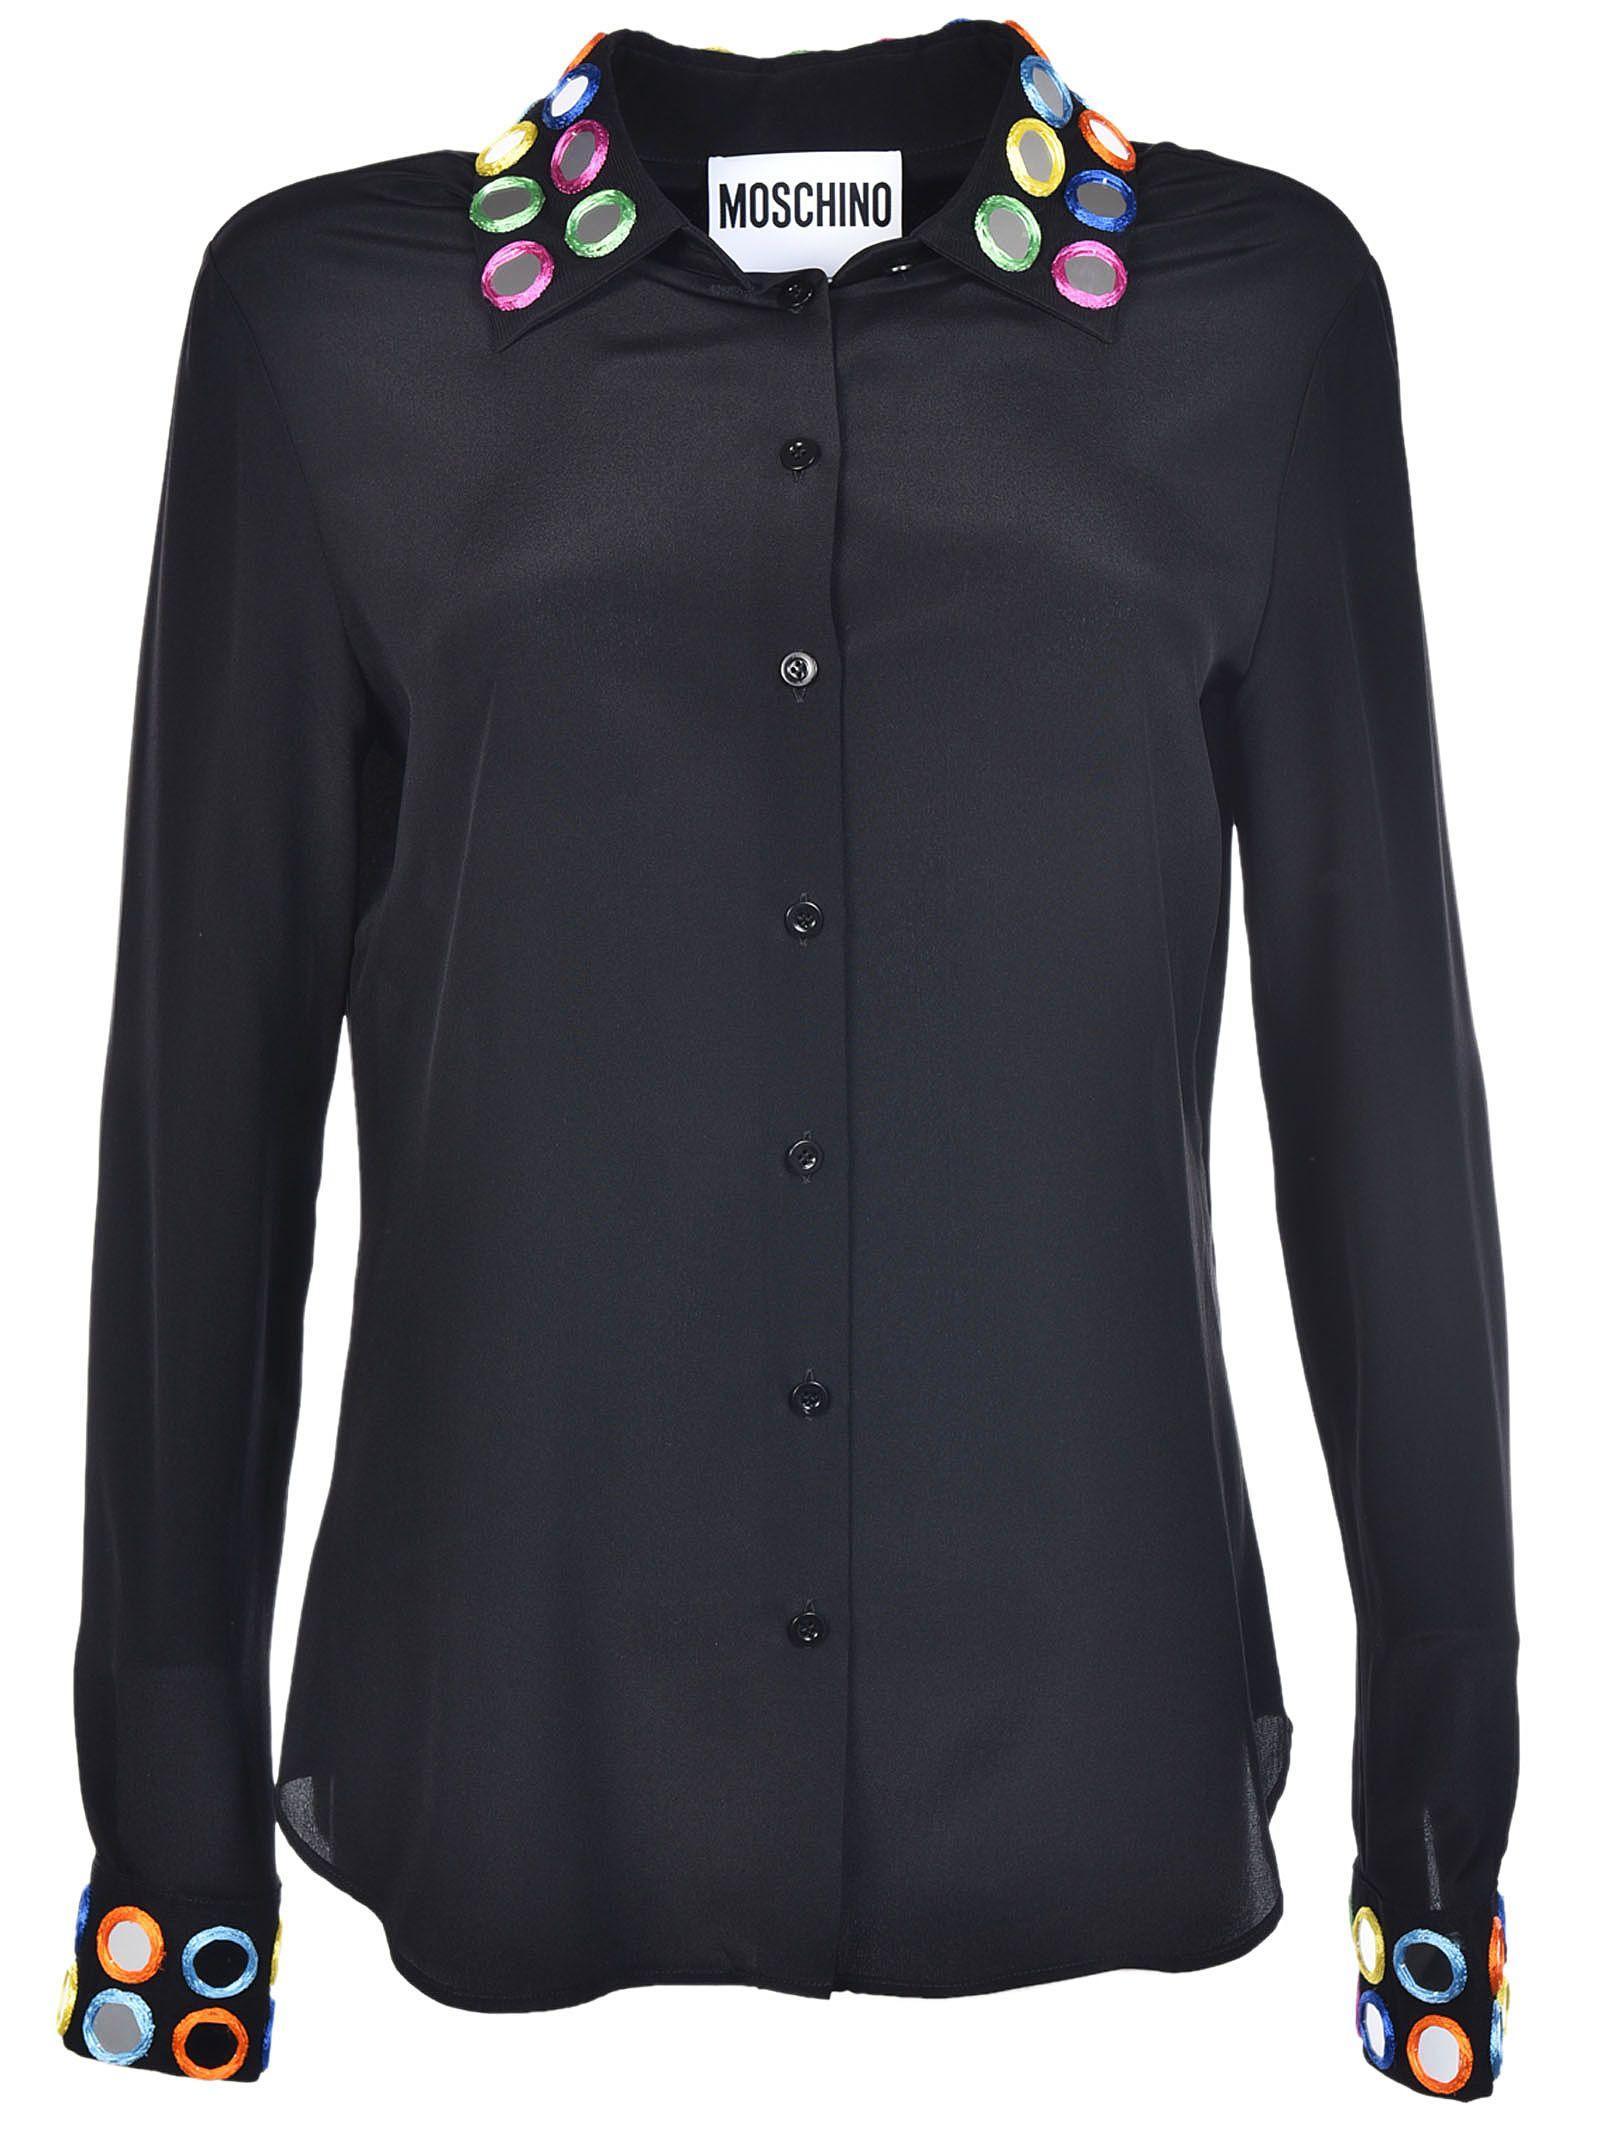 Moschino Mirror Embroidered Shirt